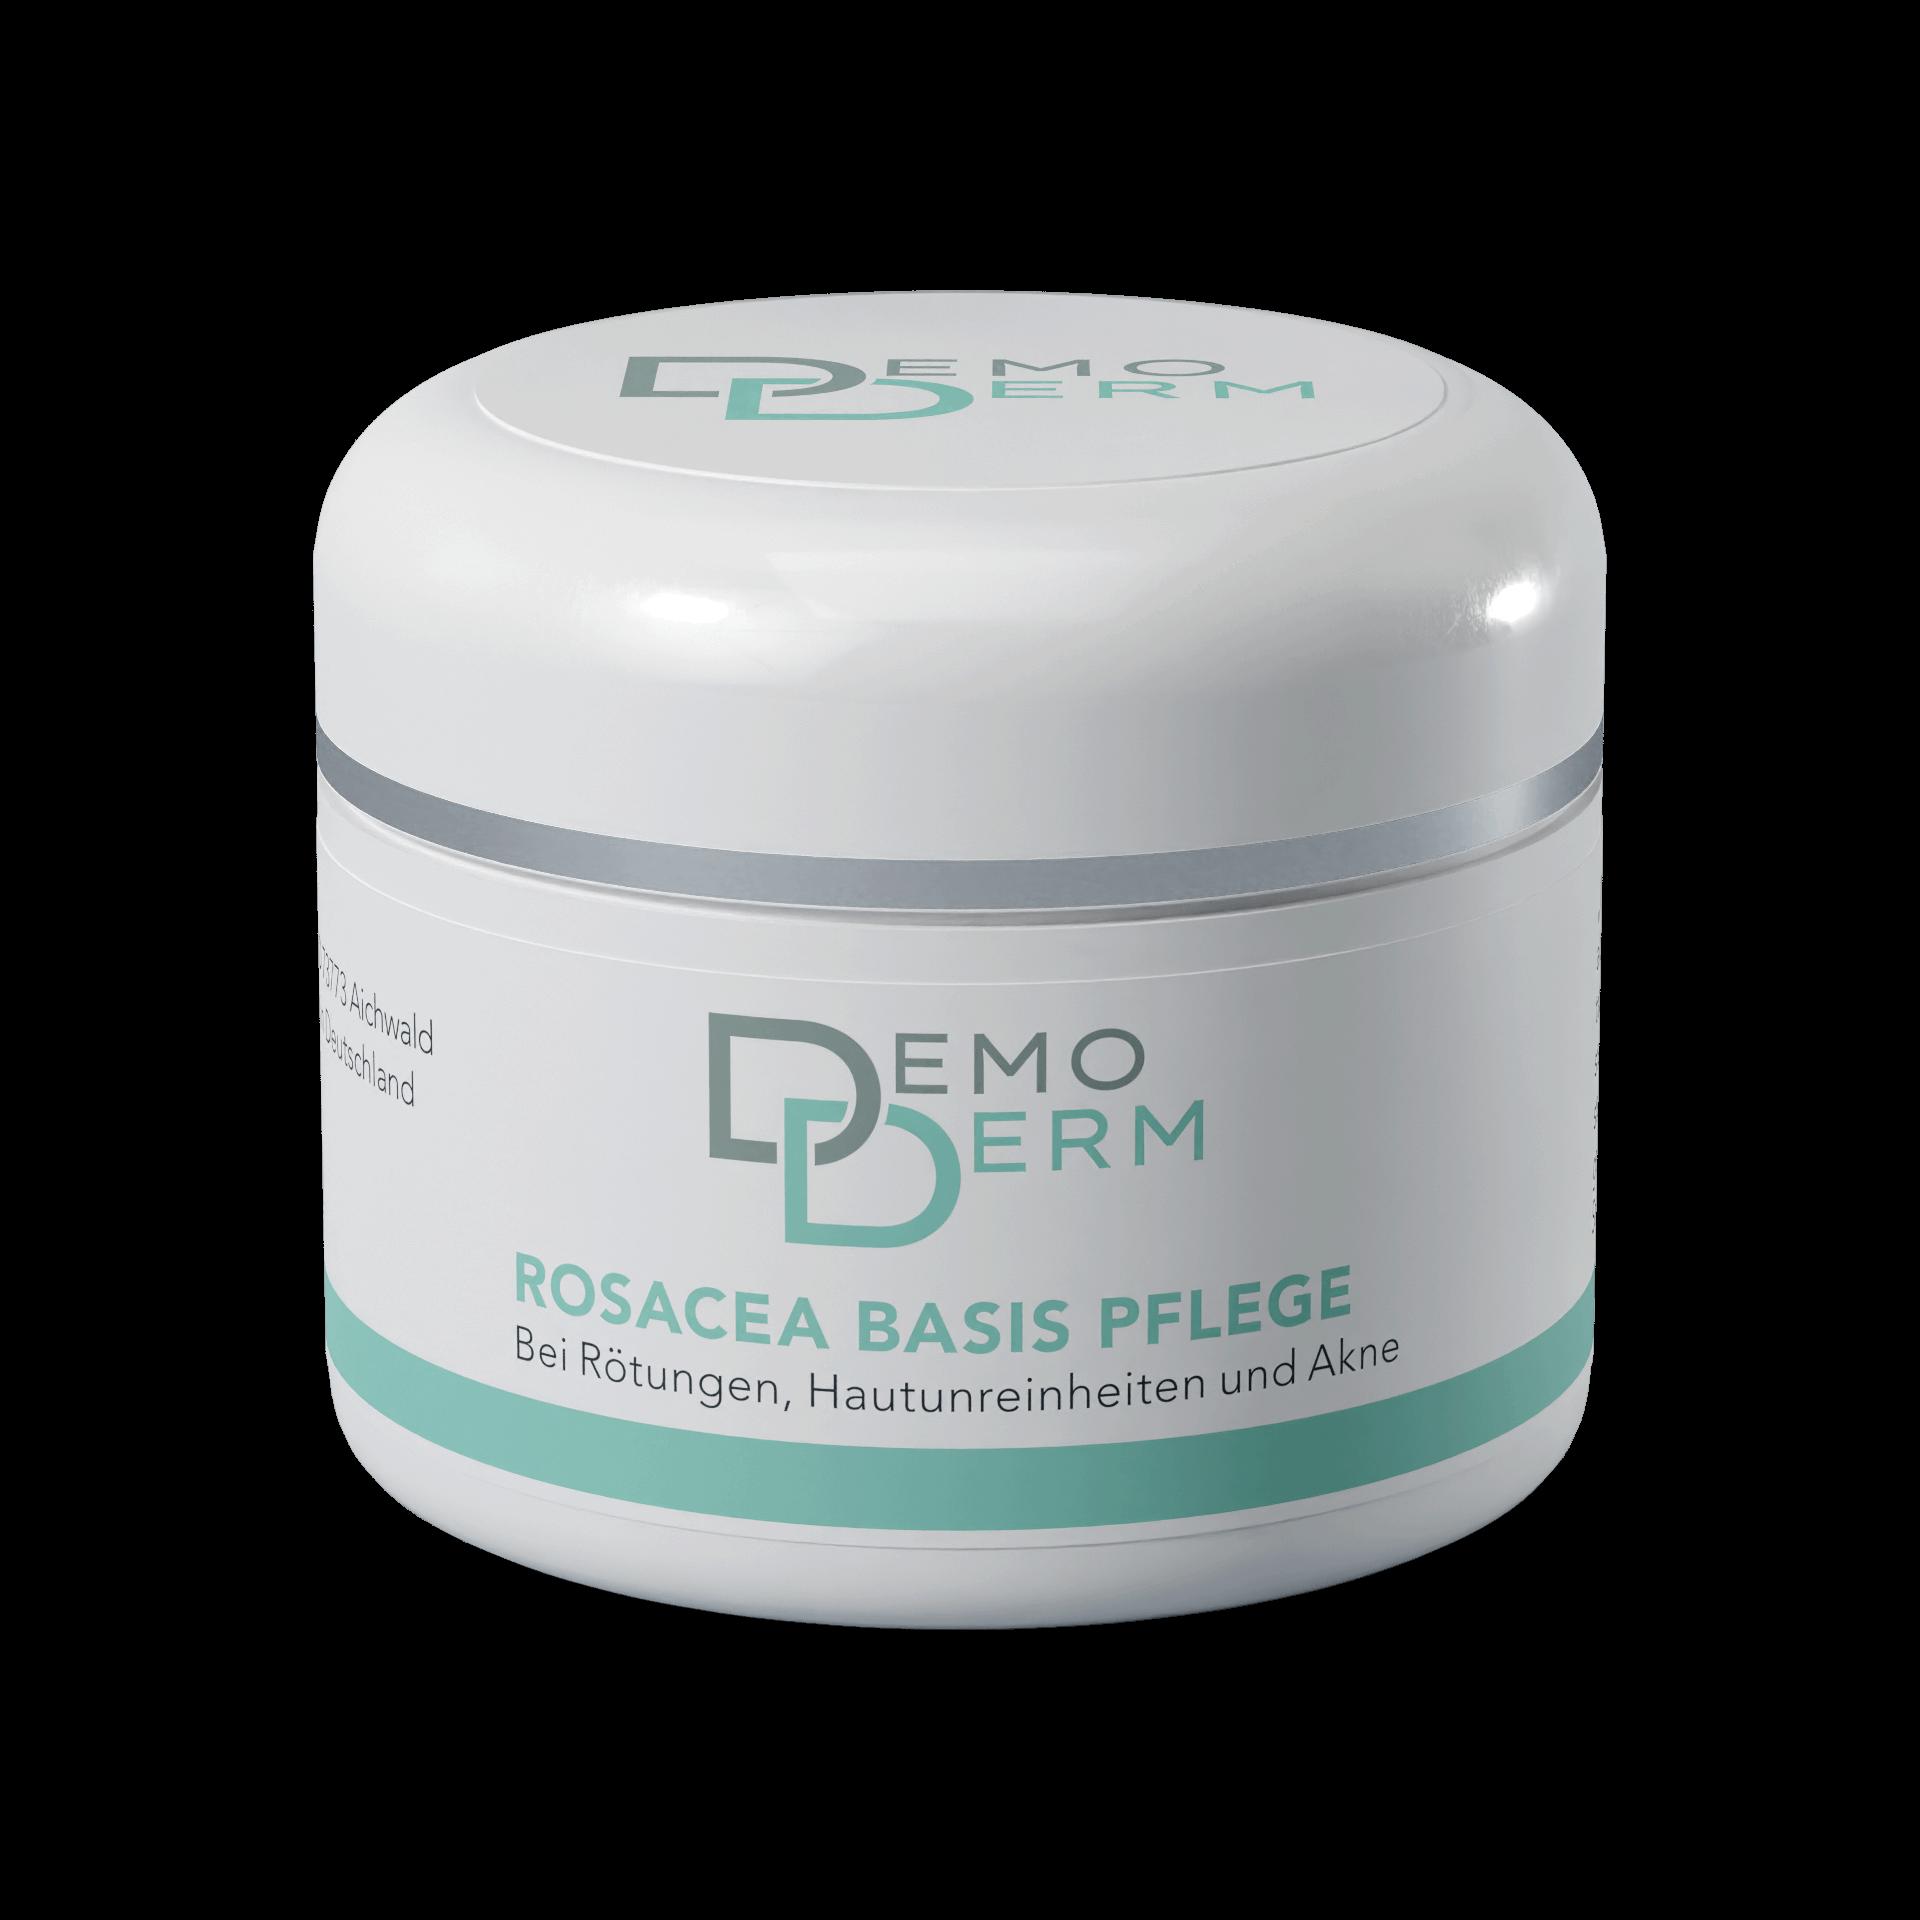 DemoDerm Rosacea Basis Pflege